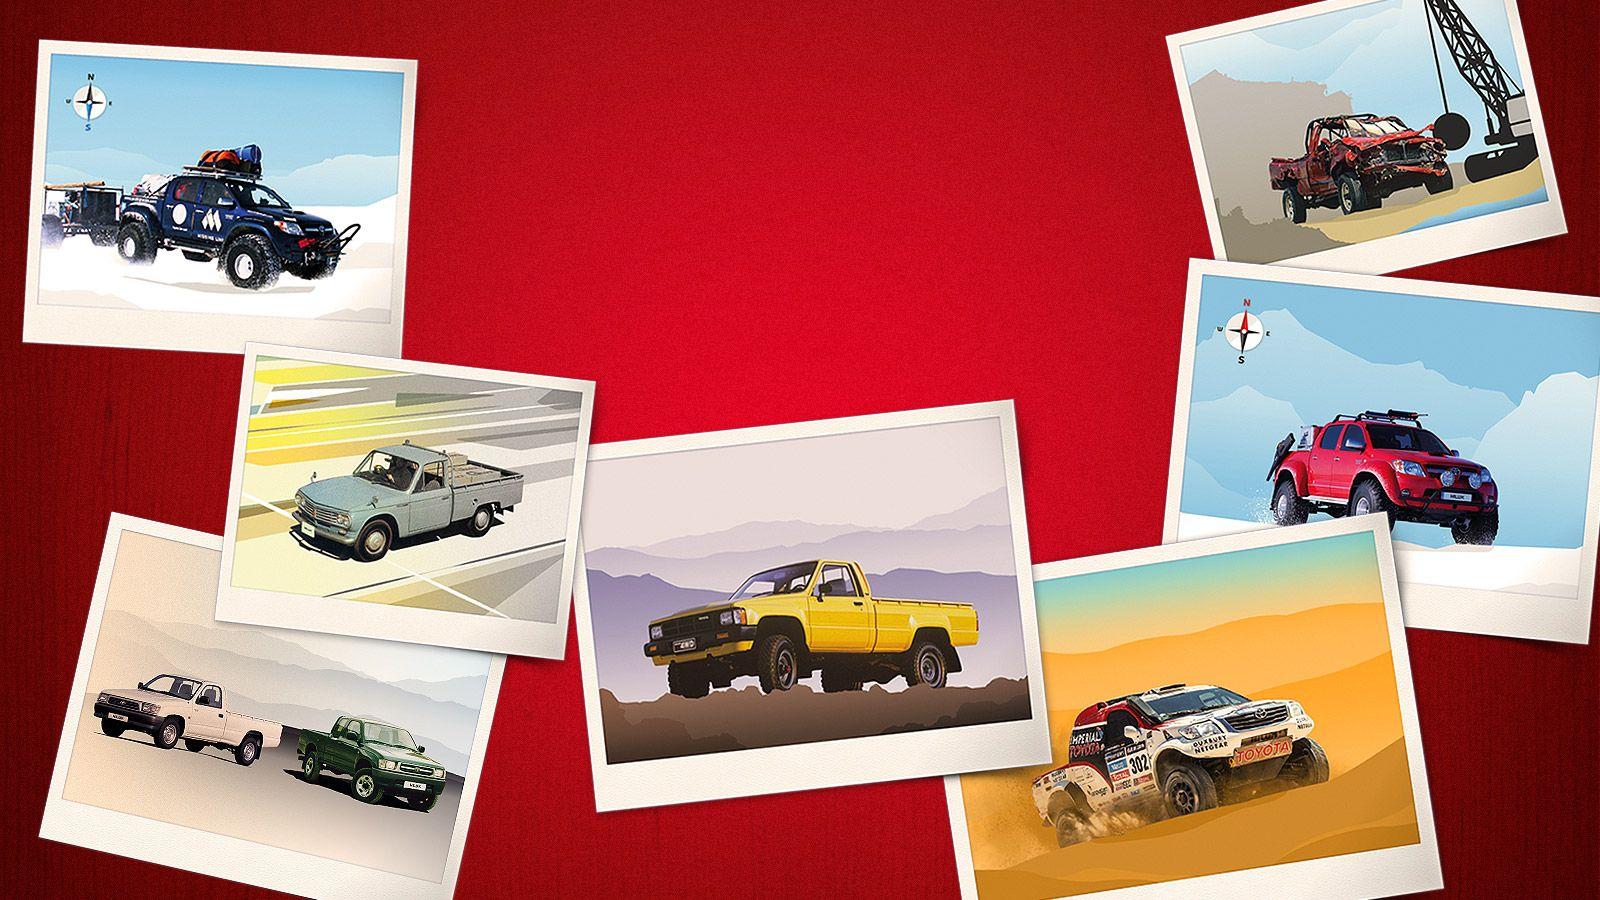 aaaad3d183 Príbeh modelu Toyota Hilux - spoznajte legendu